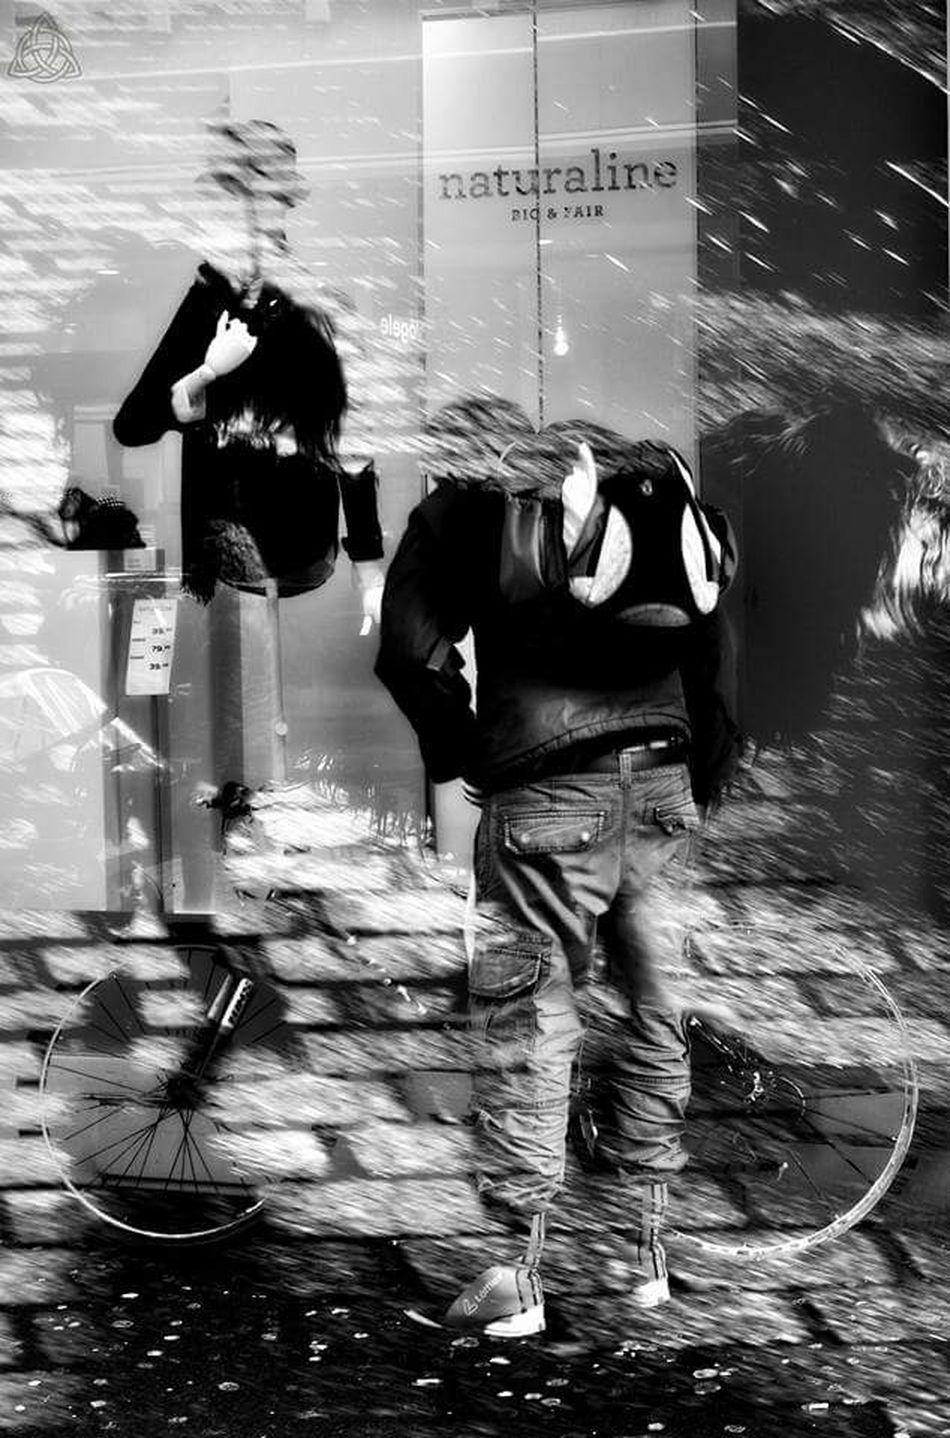 Vélocitude... Cut And Paste Streetphoto EyeEm Market © From My Point Of View Lausanne, Switzerland City Day Eyem Collection EyeEm Best Shots EyeEm Masterclass Tranquility Backgrounds Outdoors Abstract Men Eyem Best Shots EyeEm Best Edits vEyeEm Gallery Eyemphotography Eyeemphoto Eyembestpics Real People